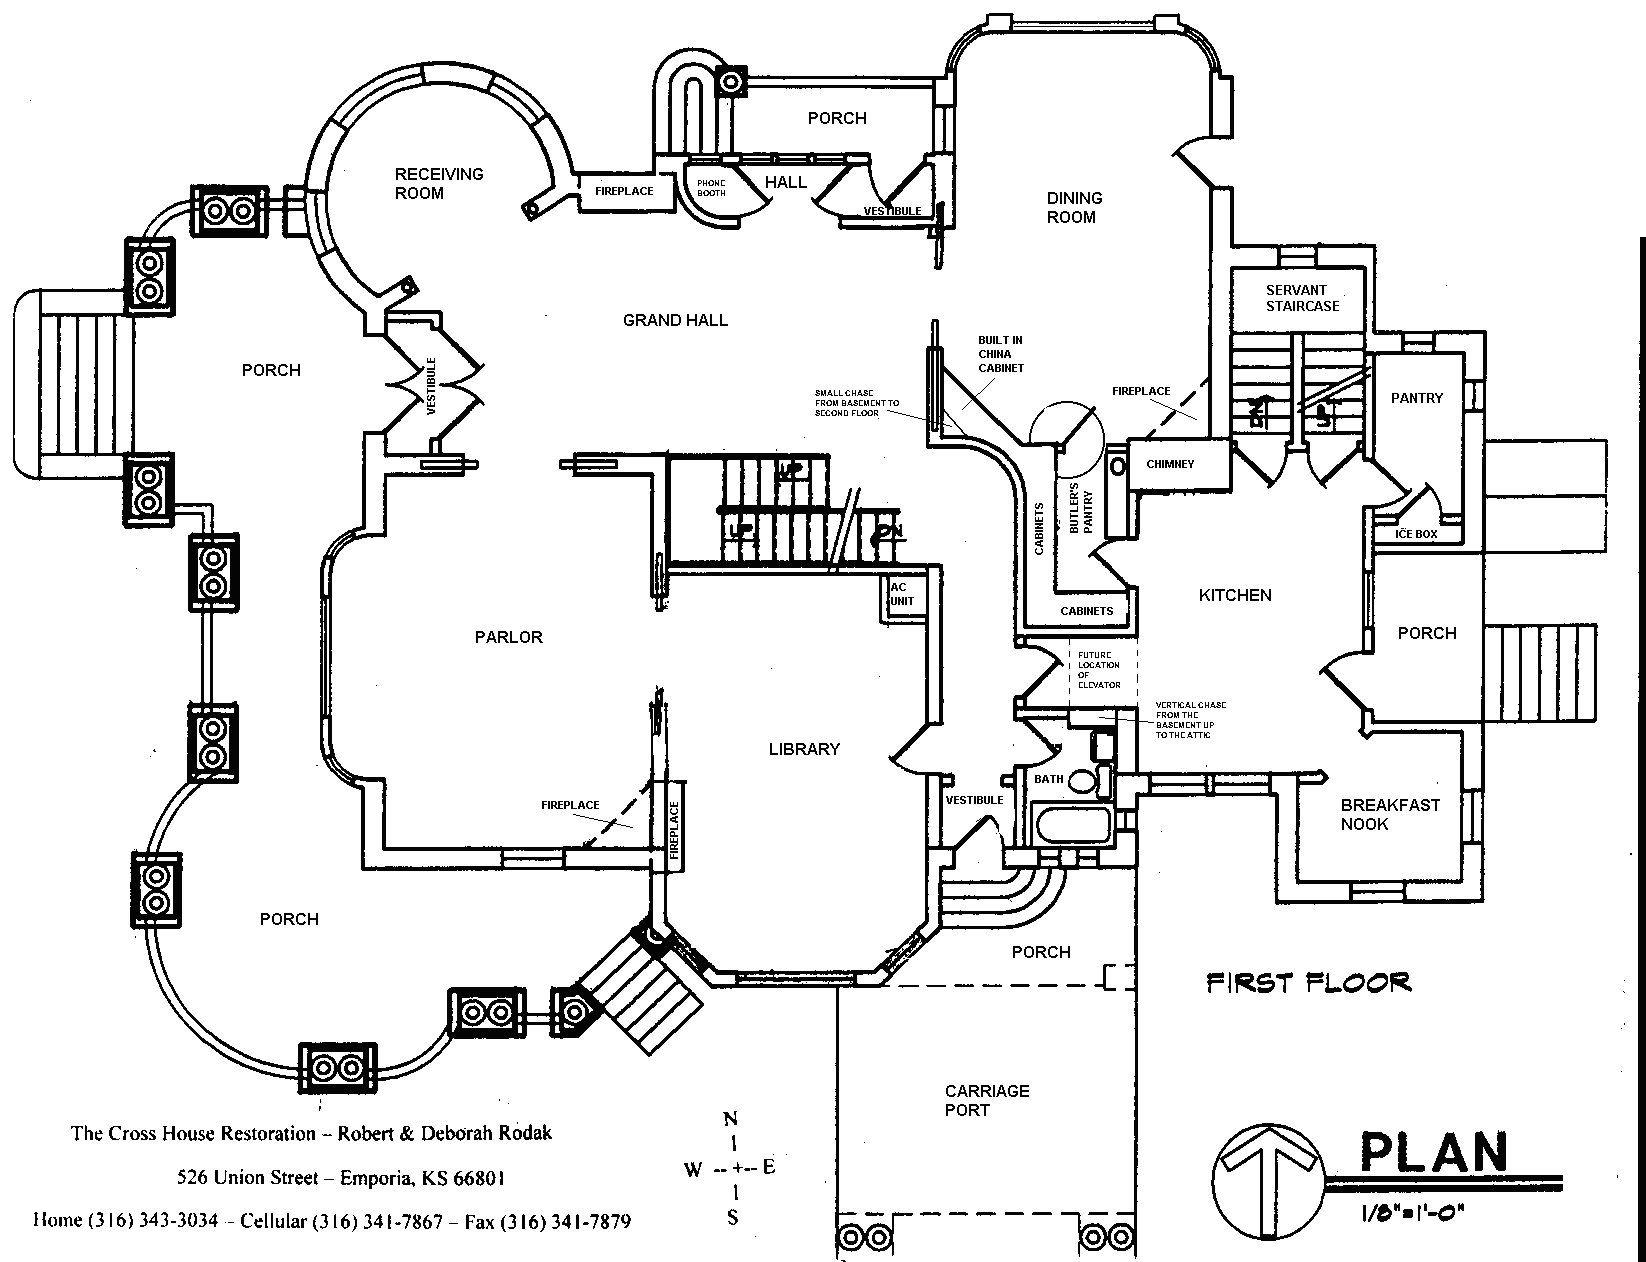 5 x 4 badezimmerdesigns minecraft house blueprints beach plans small floor  home design